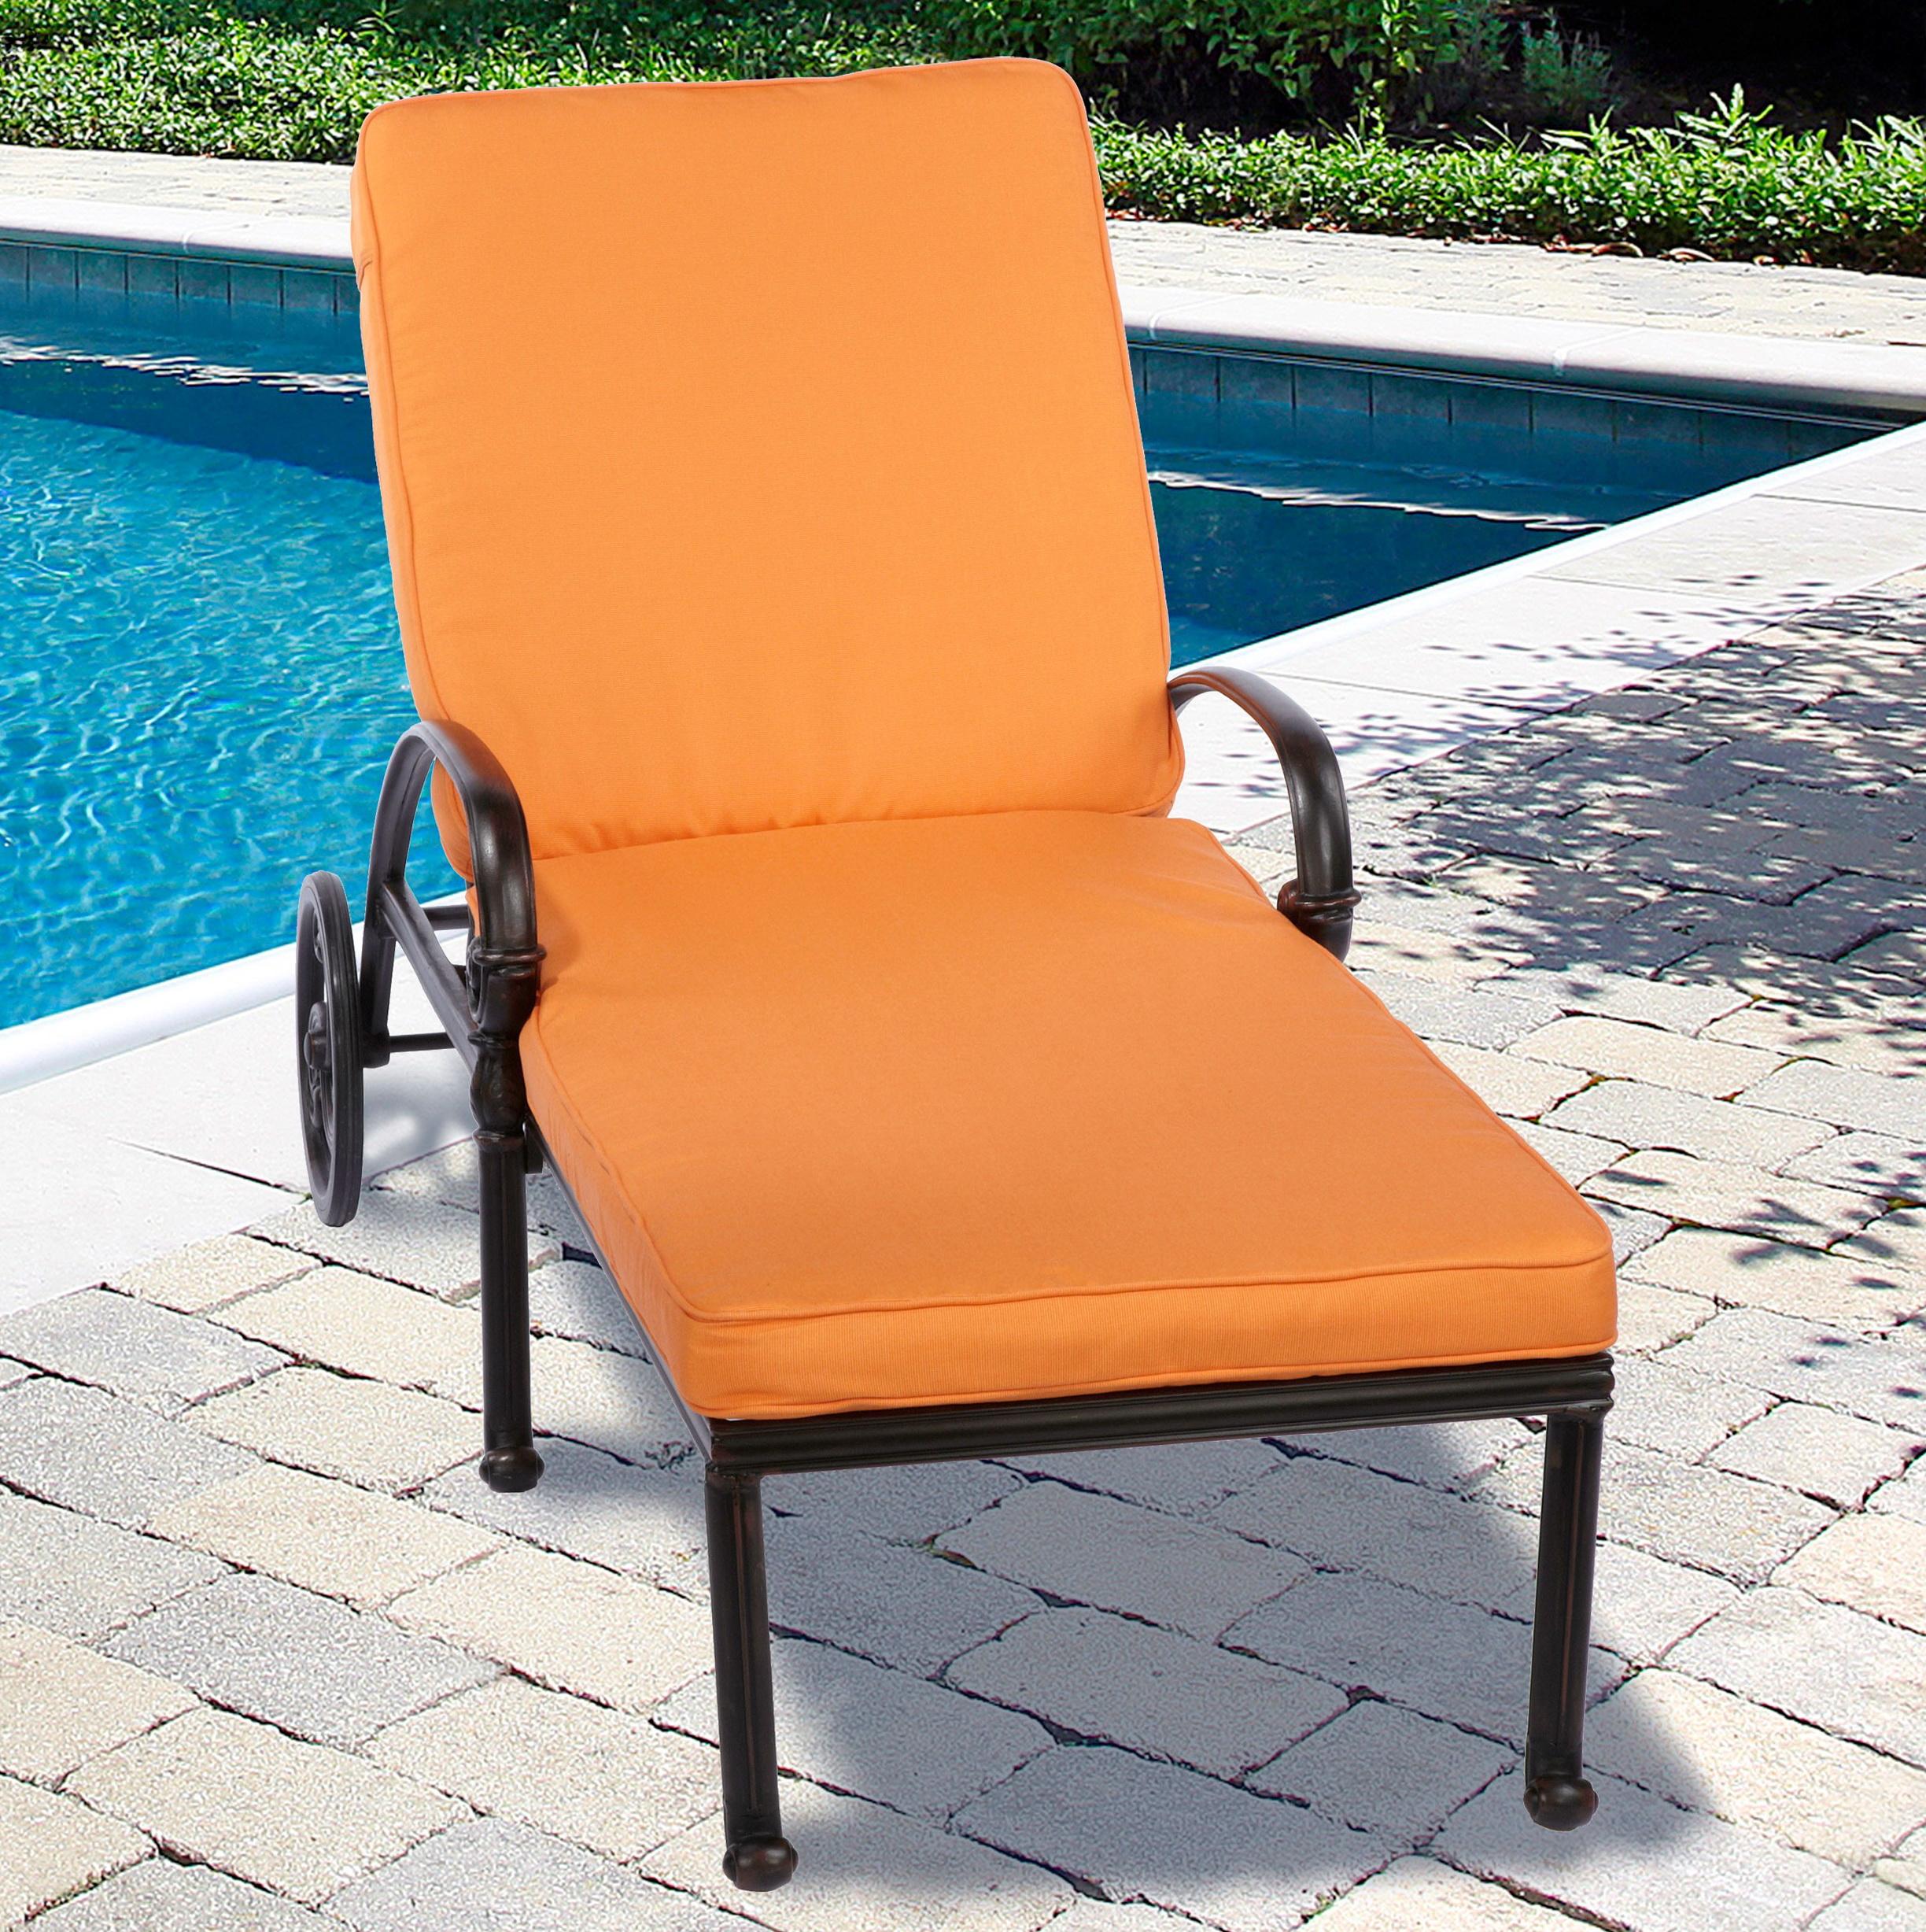 Sunbrella Replacement Cushions For Wicker Furniture Home